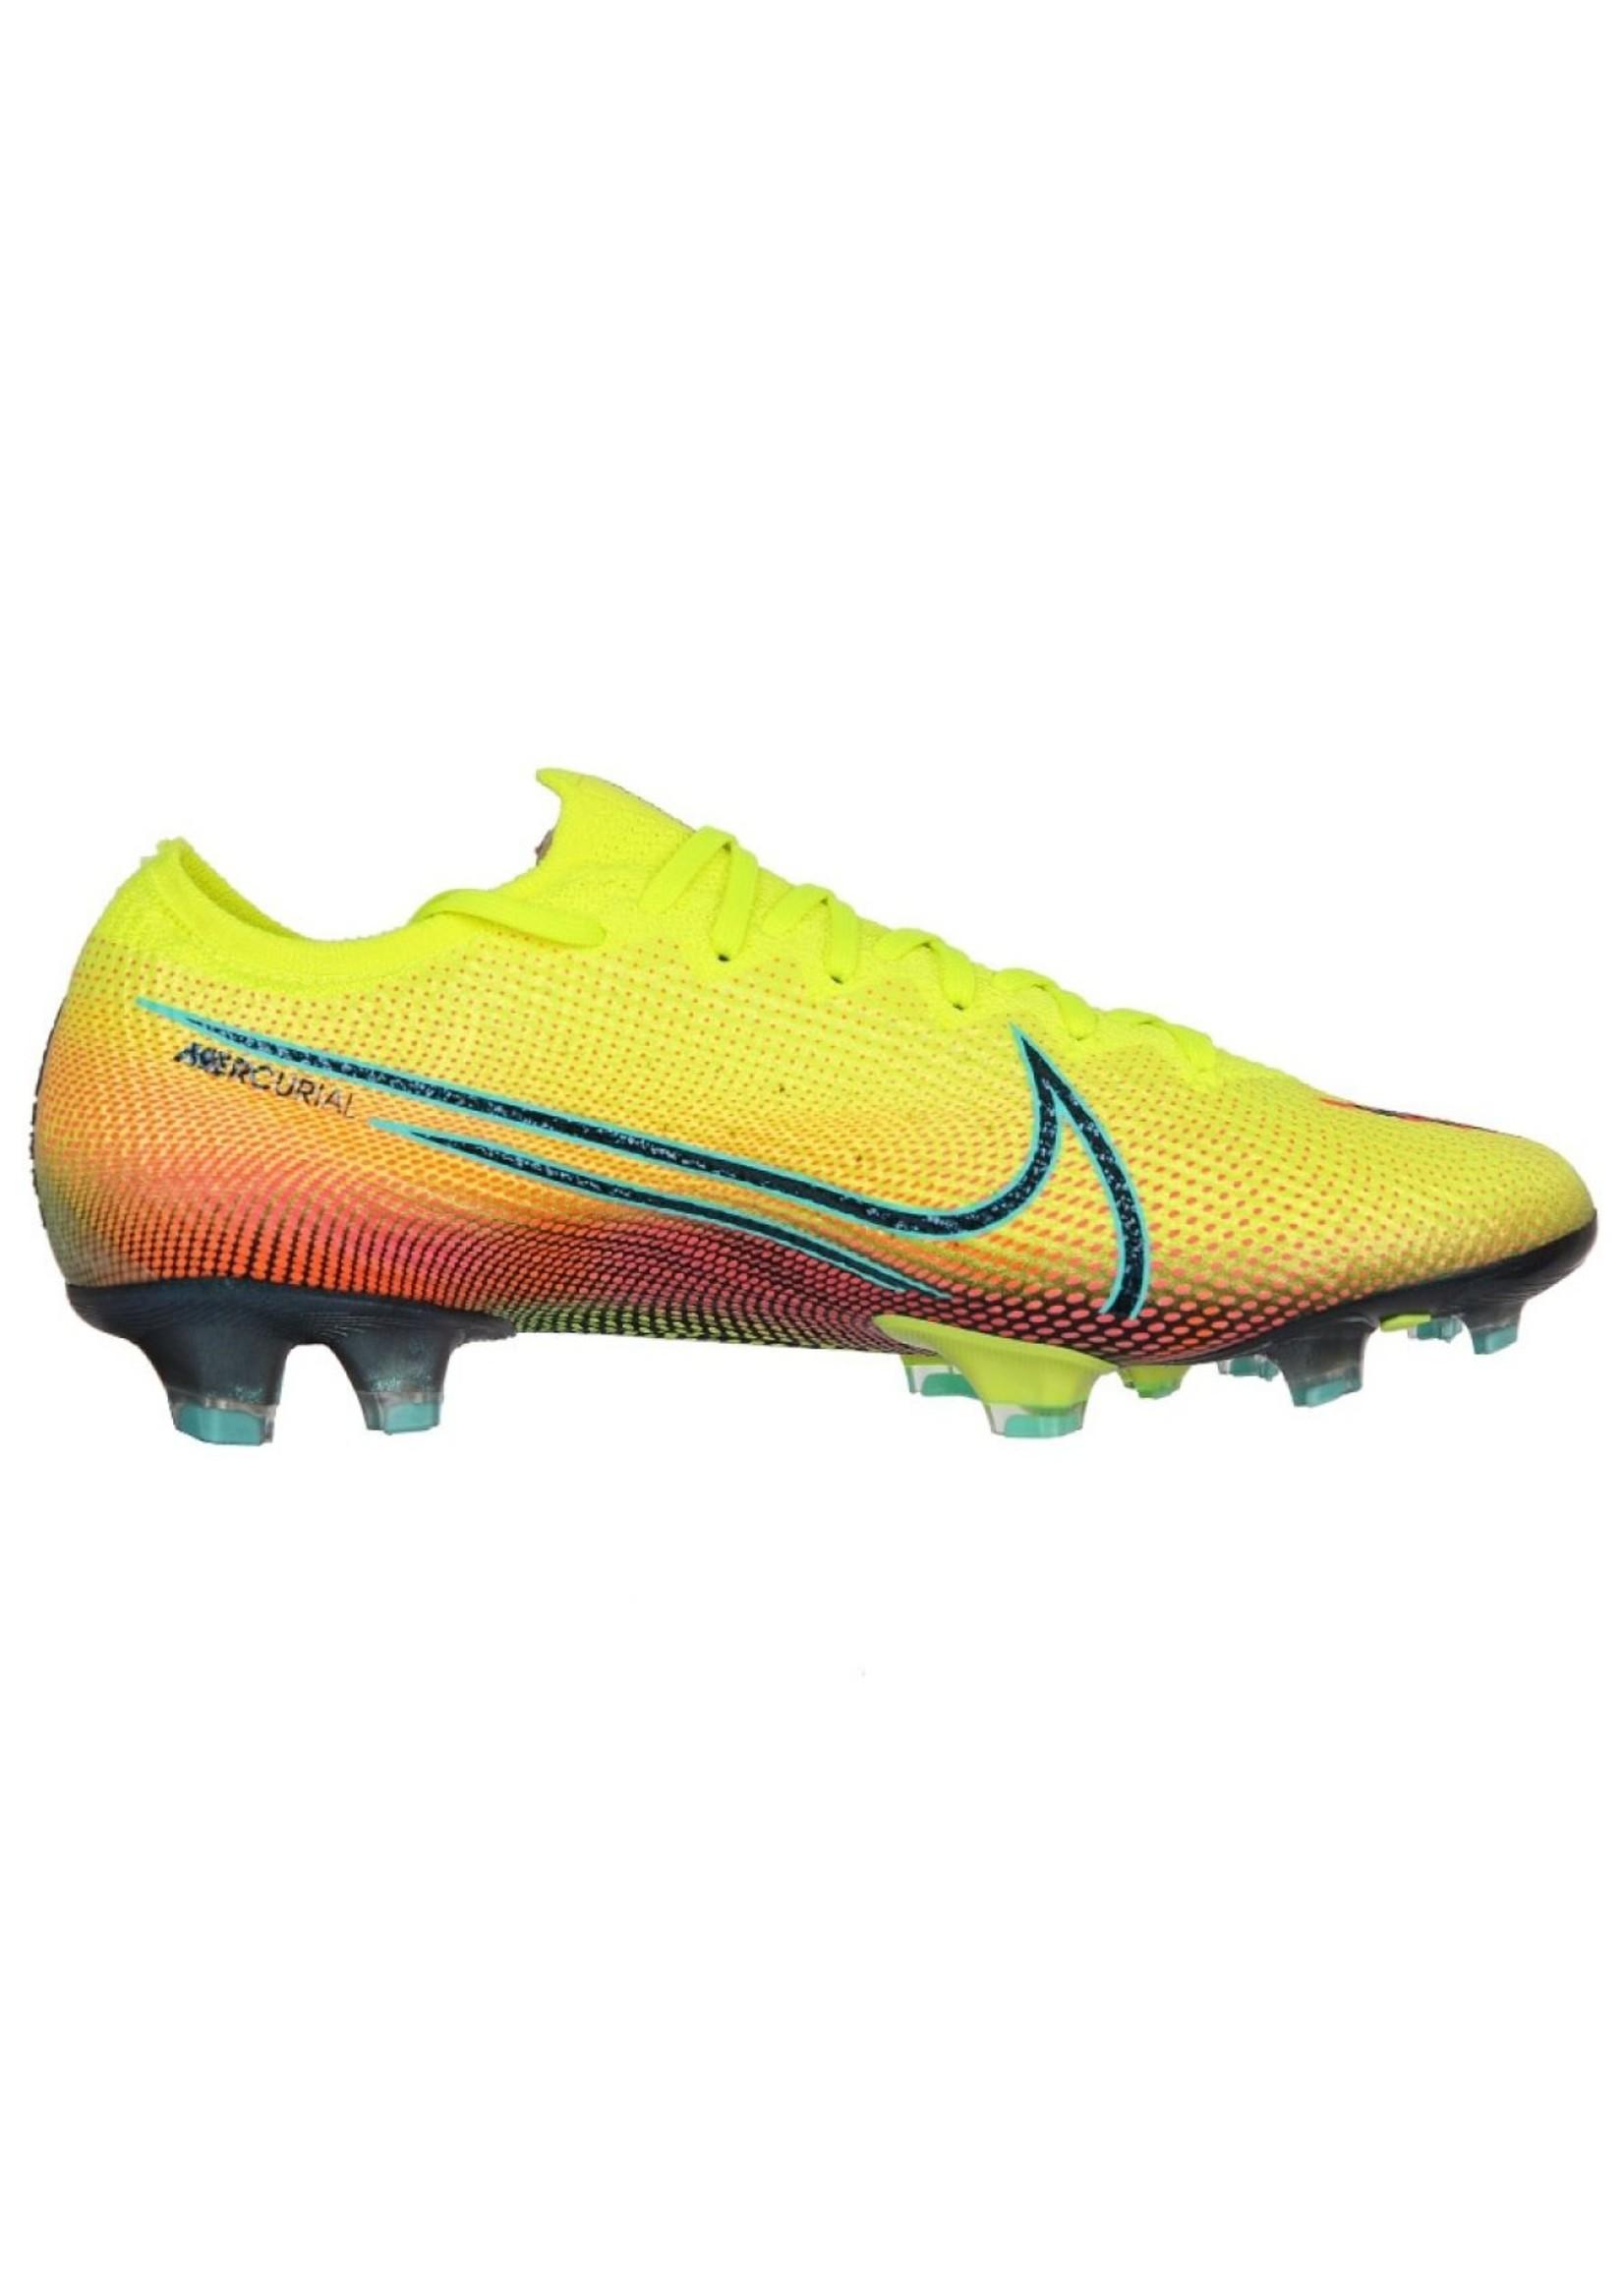 Nike VAPOR 13 ELITE MDS FG